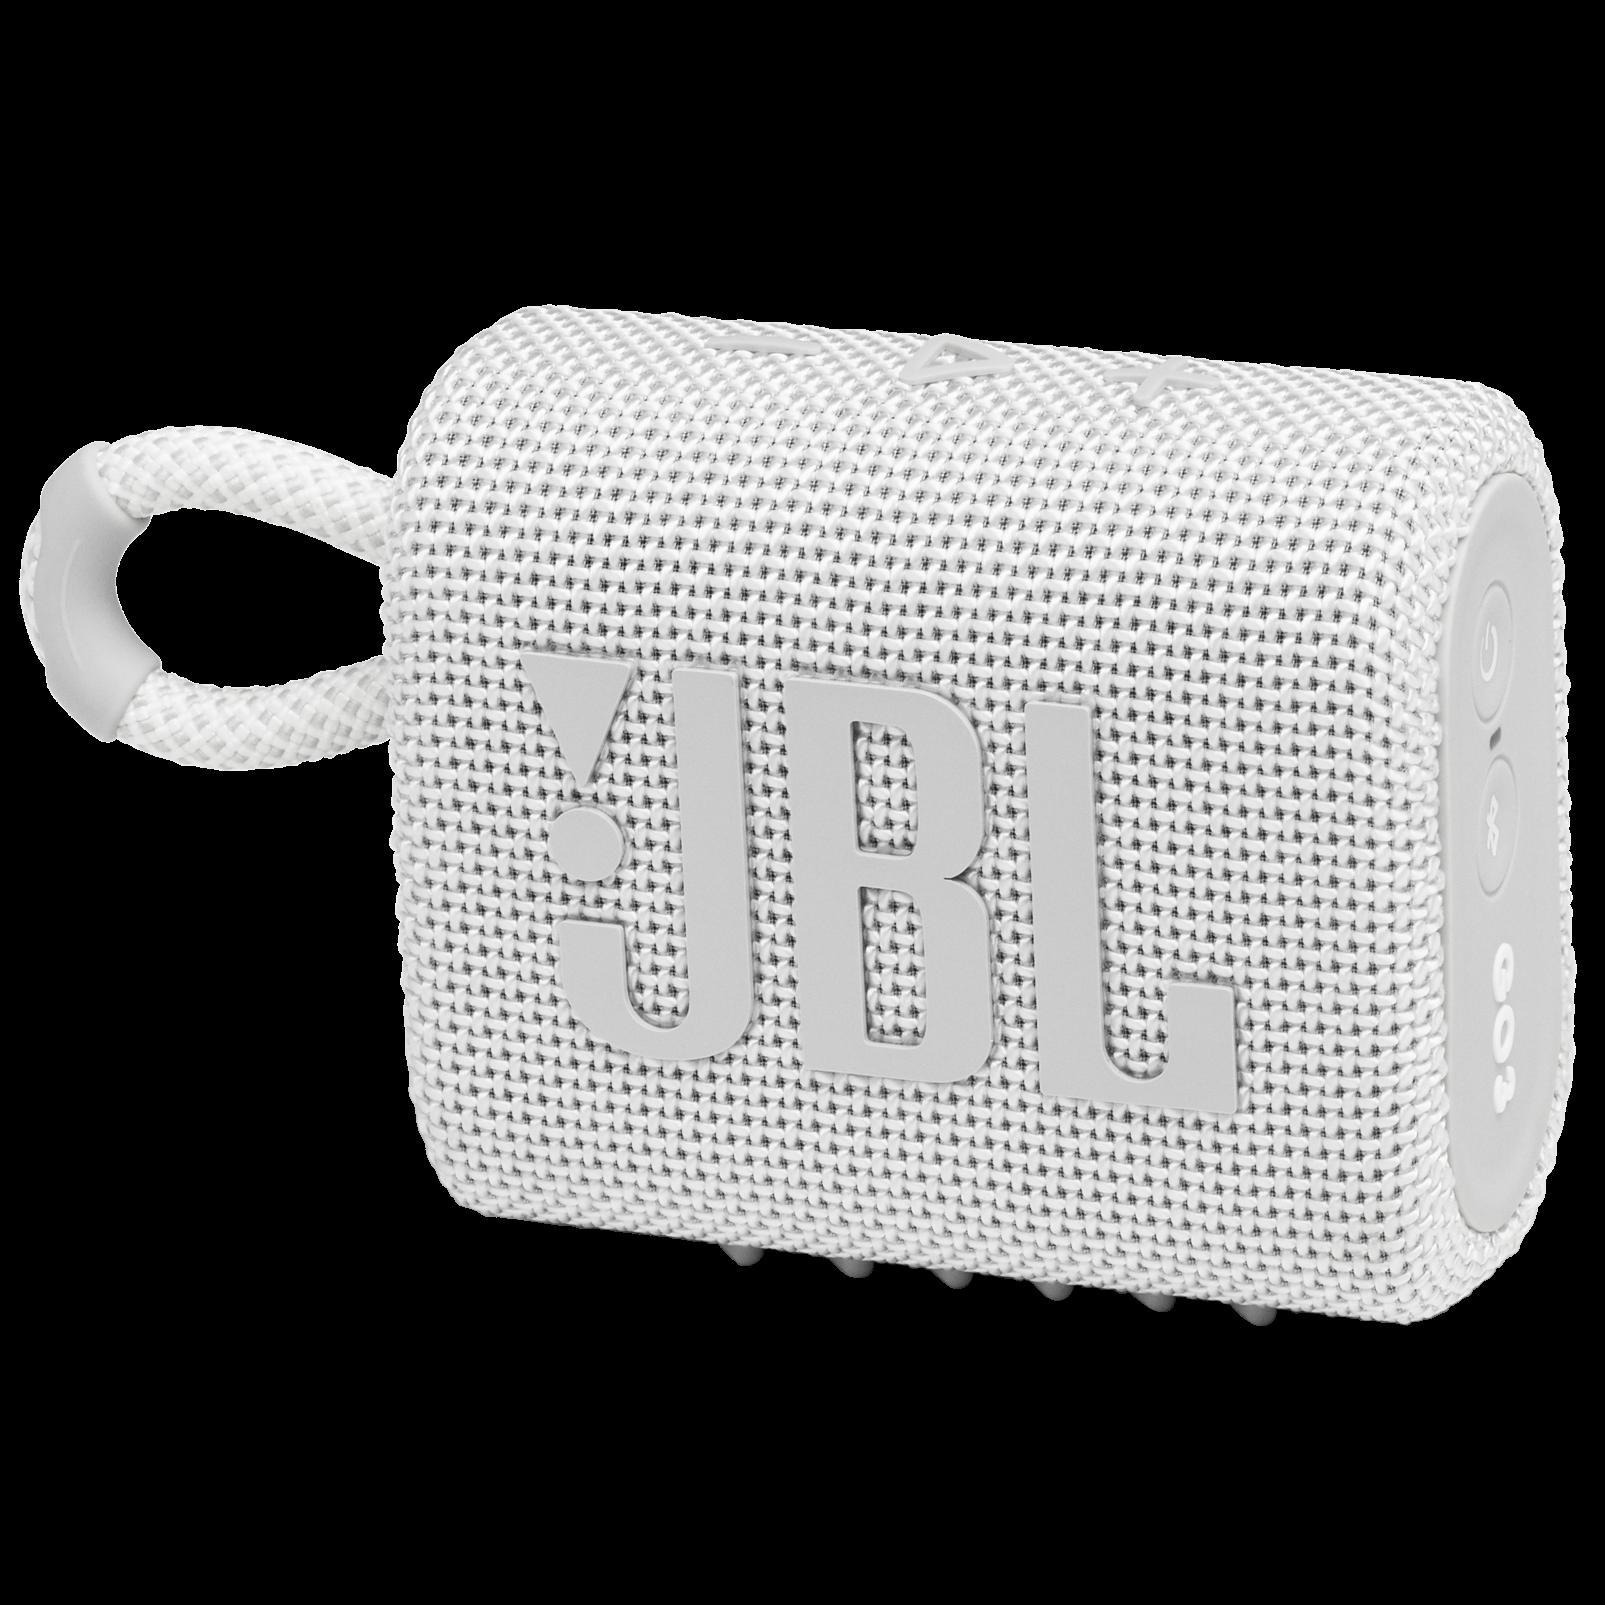 JBL GO 3 - White - Portable Waterproof Speaker - Hero